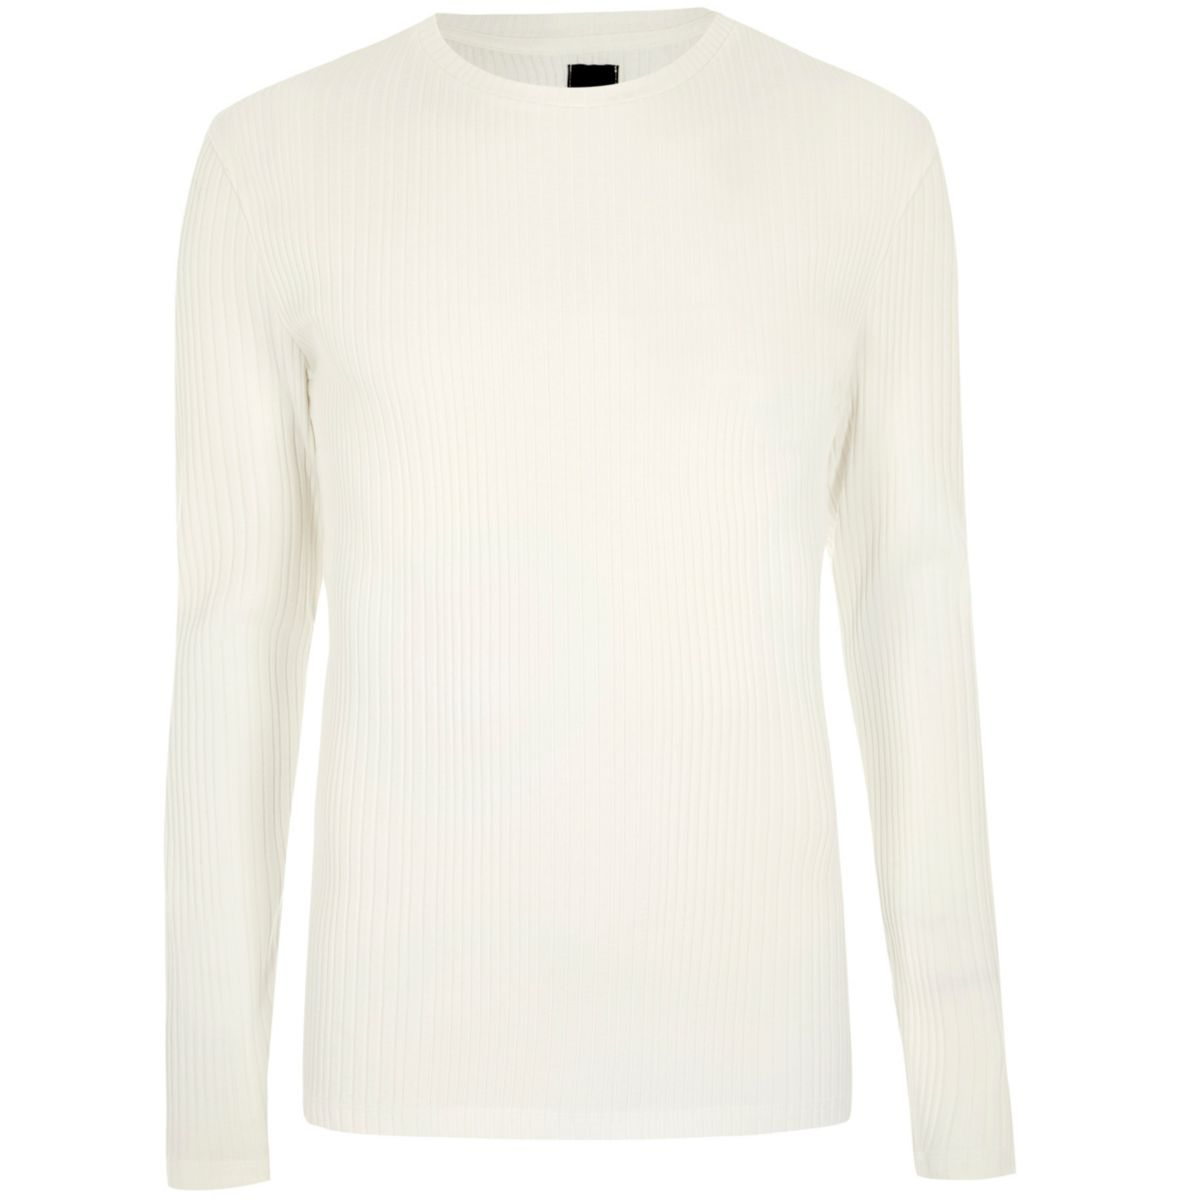 Cream ribbed long sleeve knit T-shirt